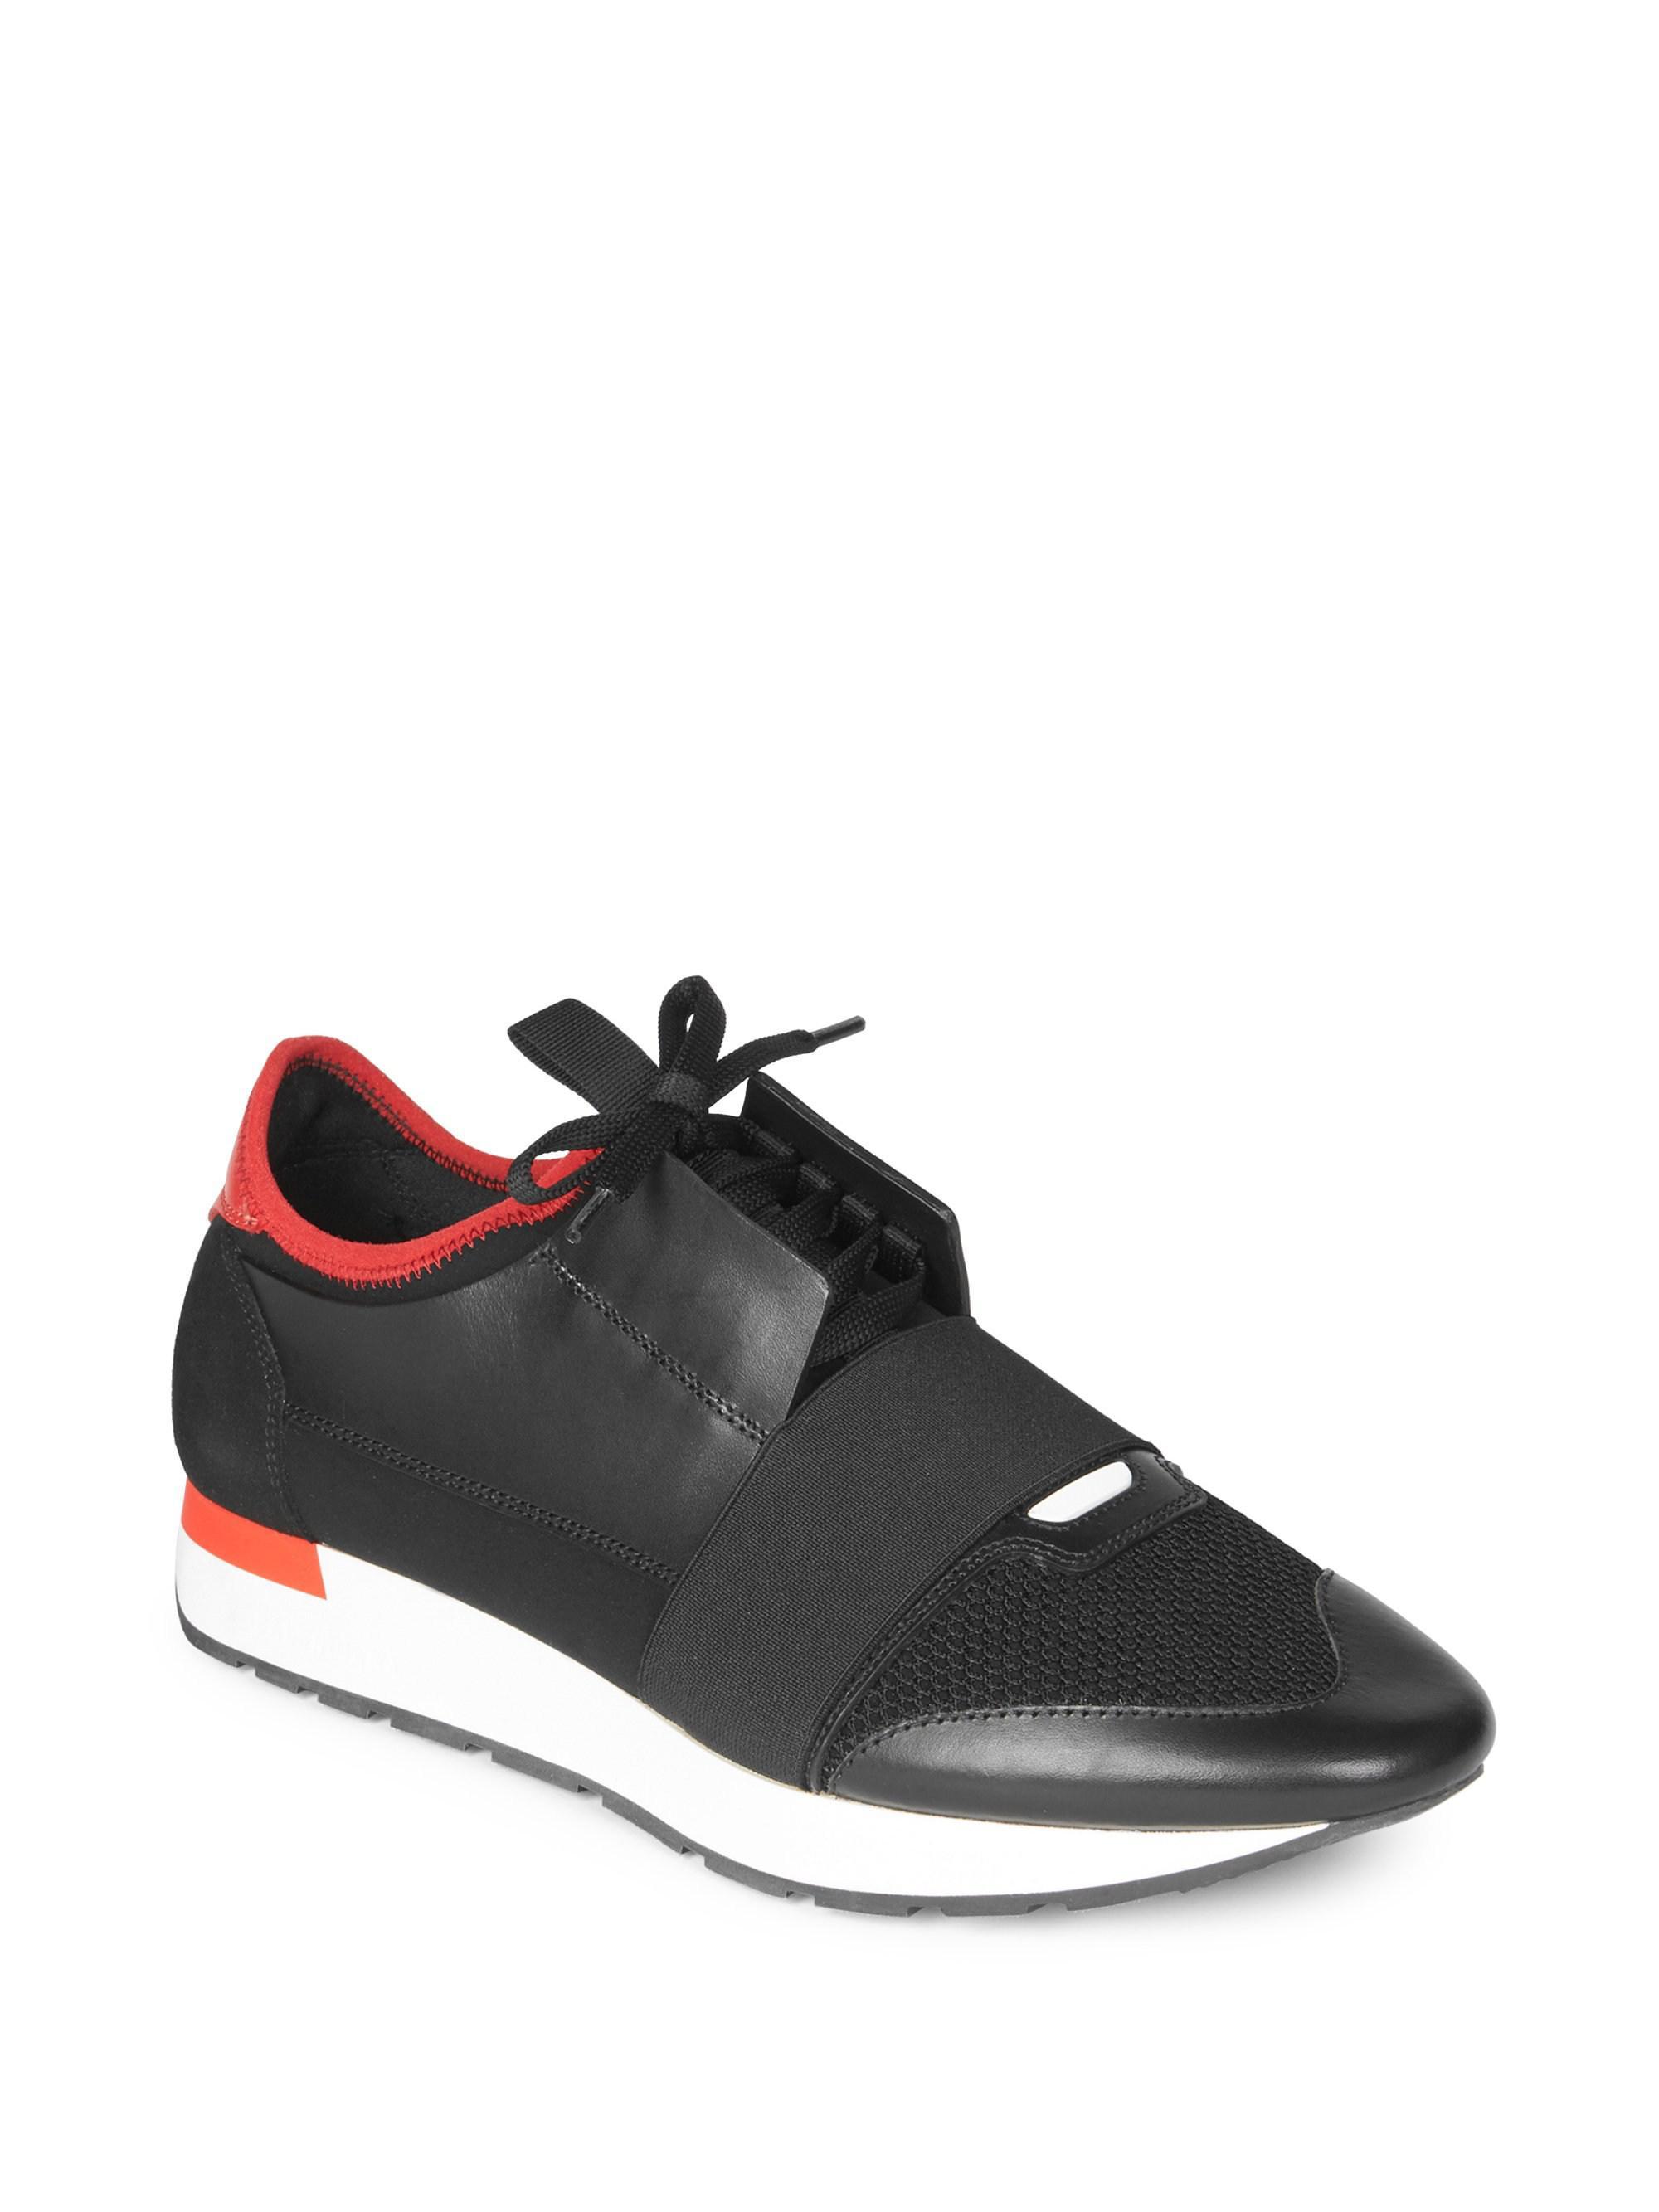 f4587b6420d6 Lyst - Balenciaga Race Runner Sneakers in Black for Men